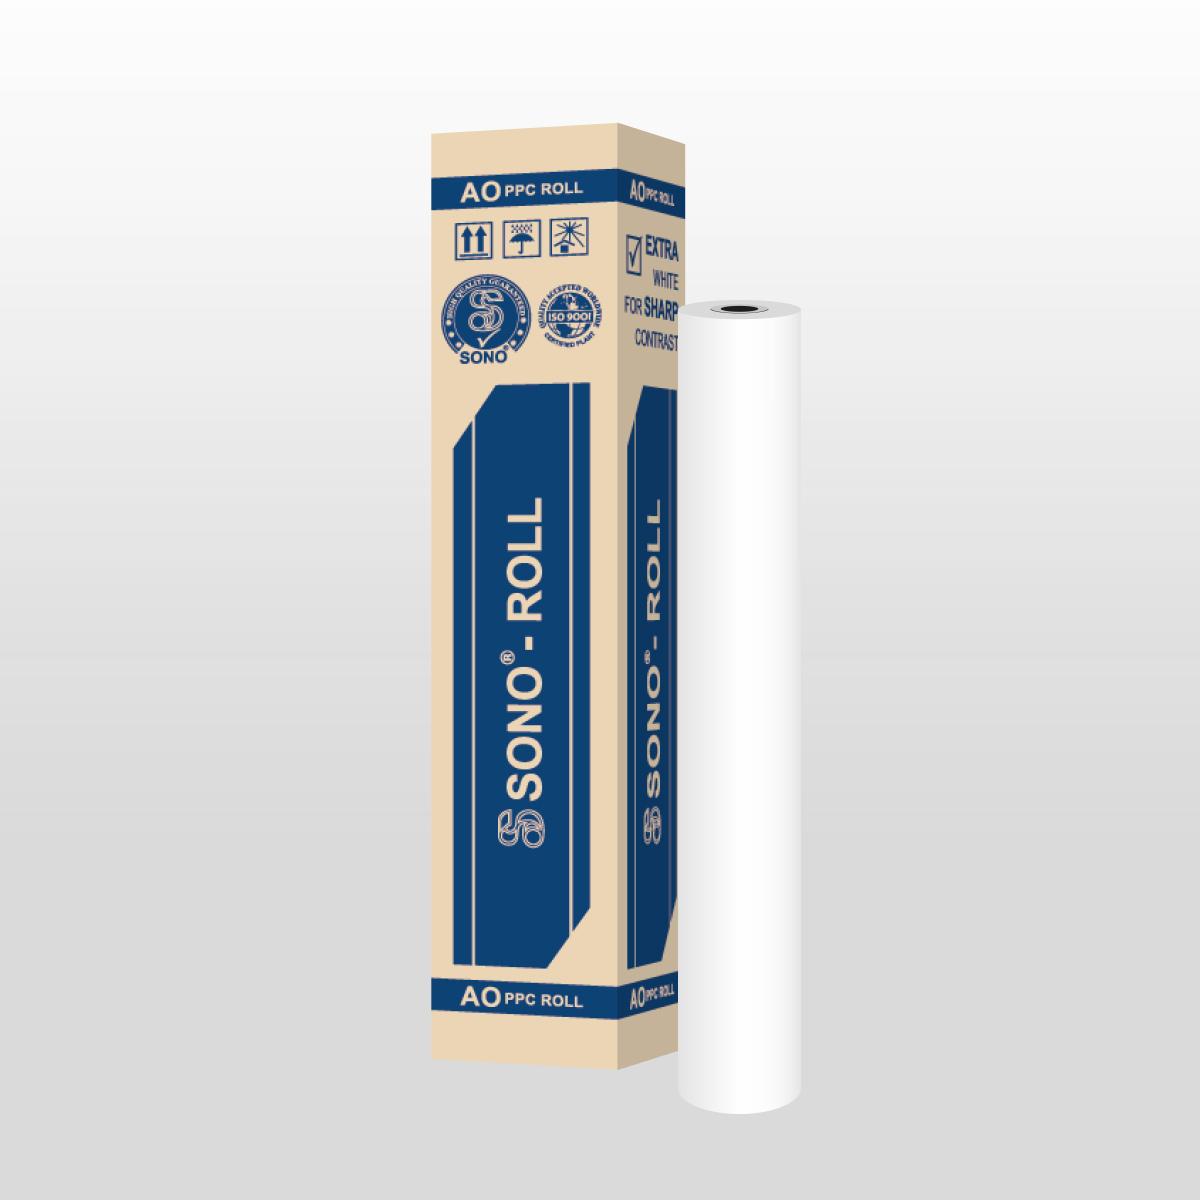 Sono-Roll Plan Printing Paper / Plotter Roll